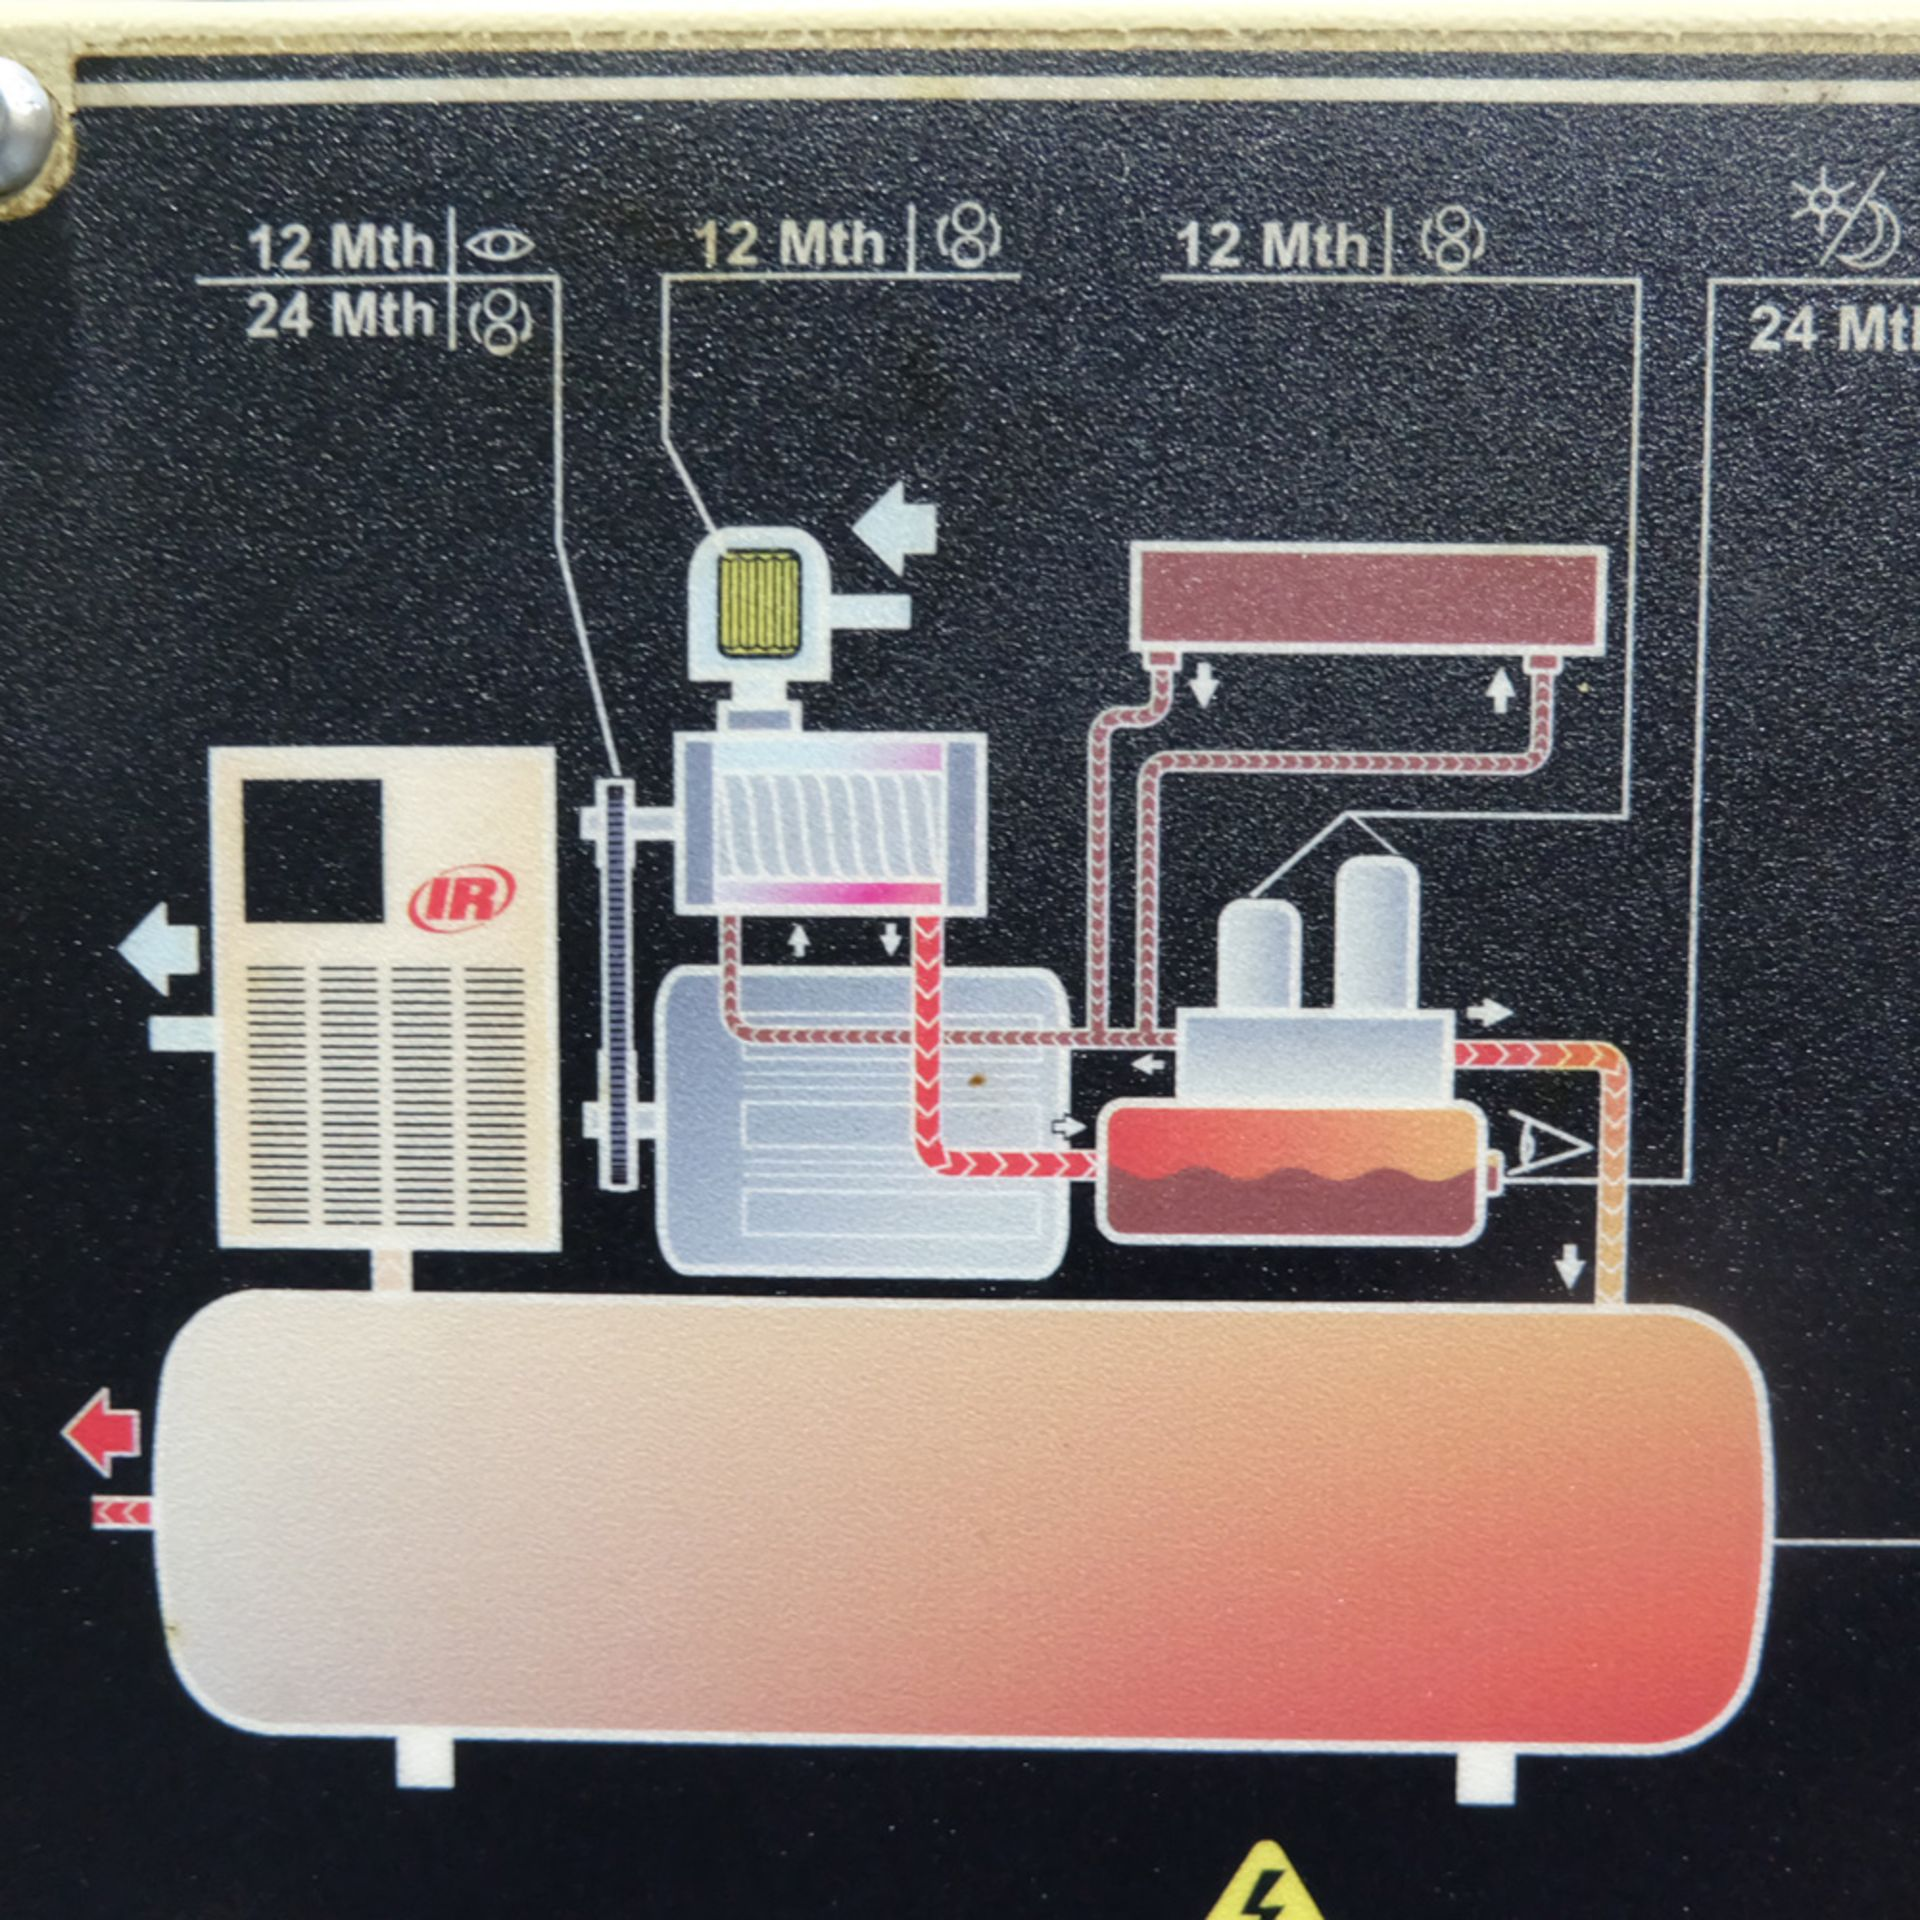 Ingersoll Rand Model R5.5IU D-SD Rotary Air Compressor. Working Pressure 10 Bar. - Image 4 of 9